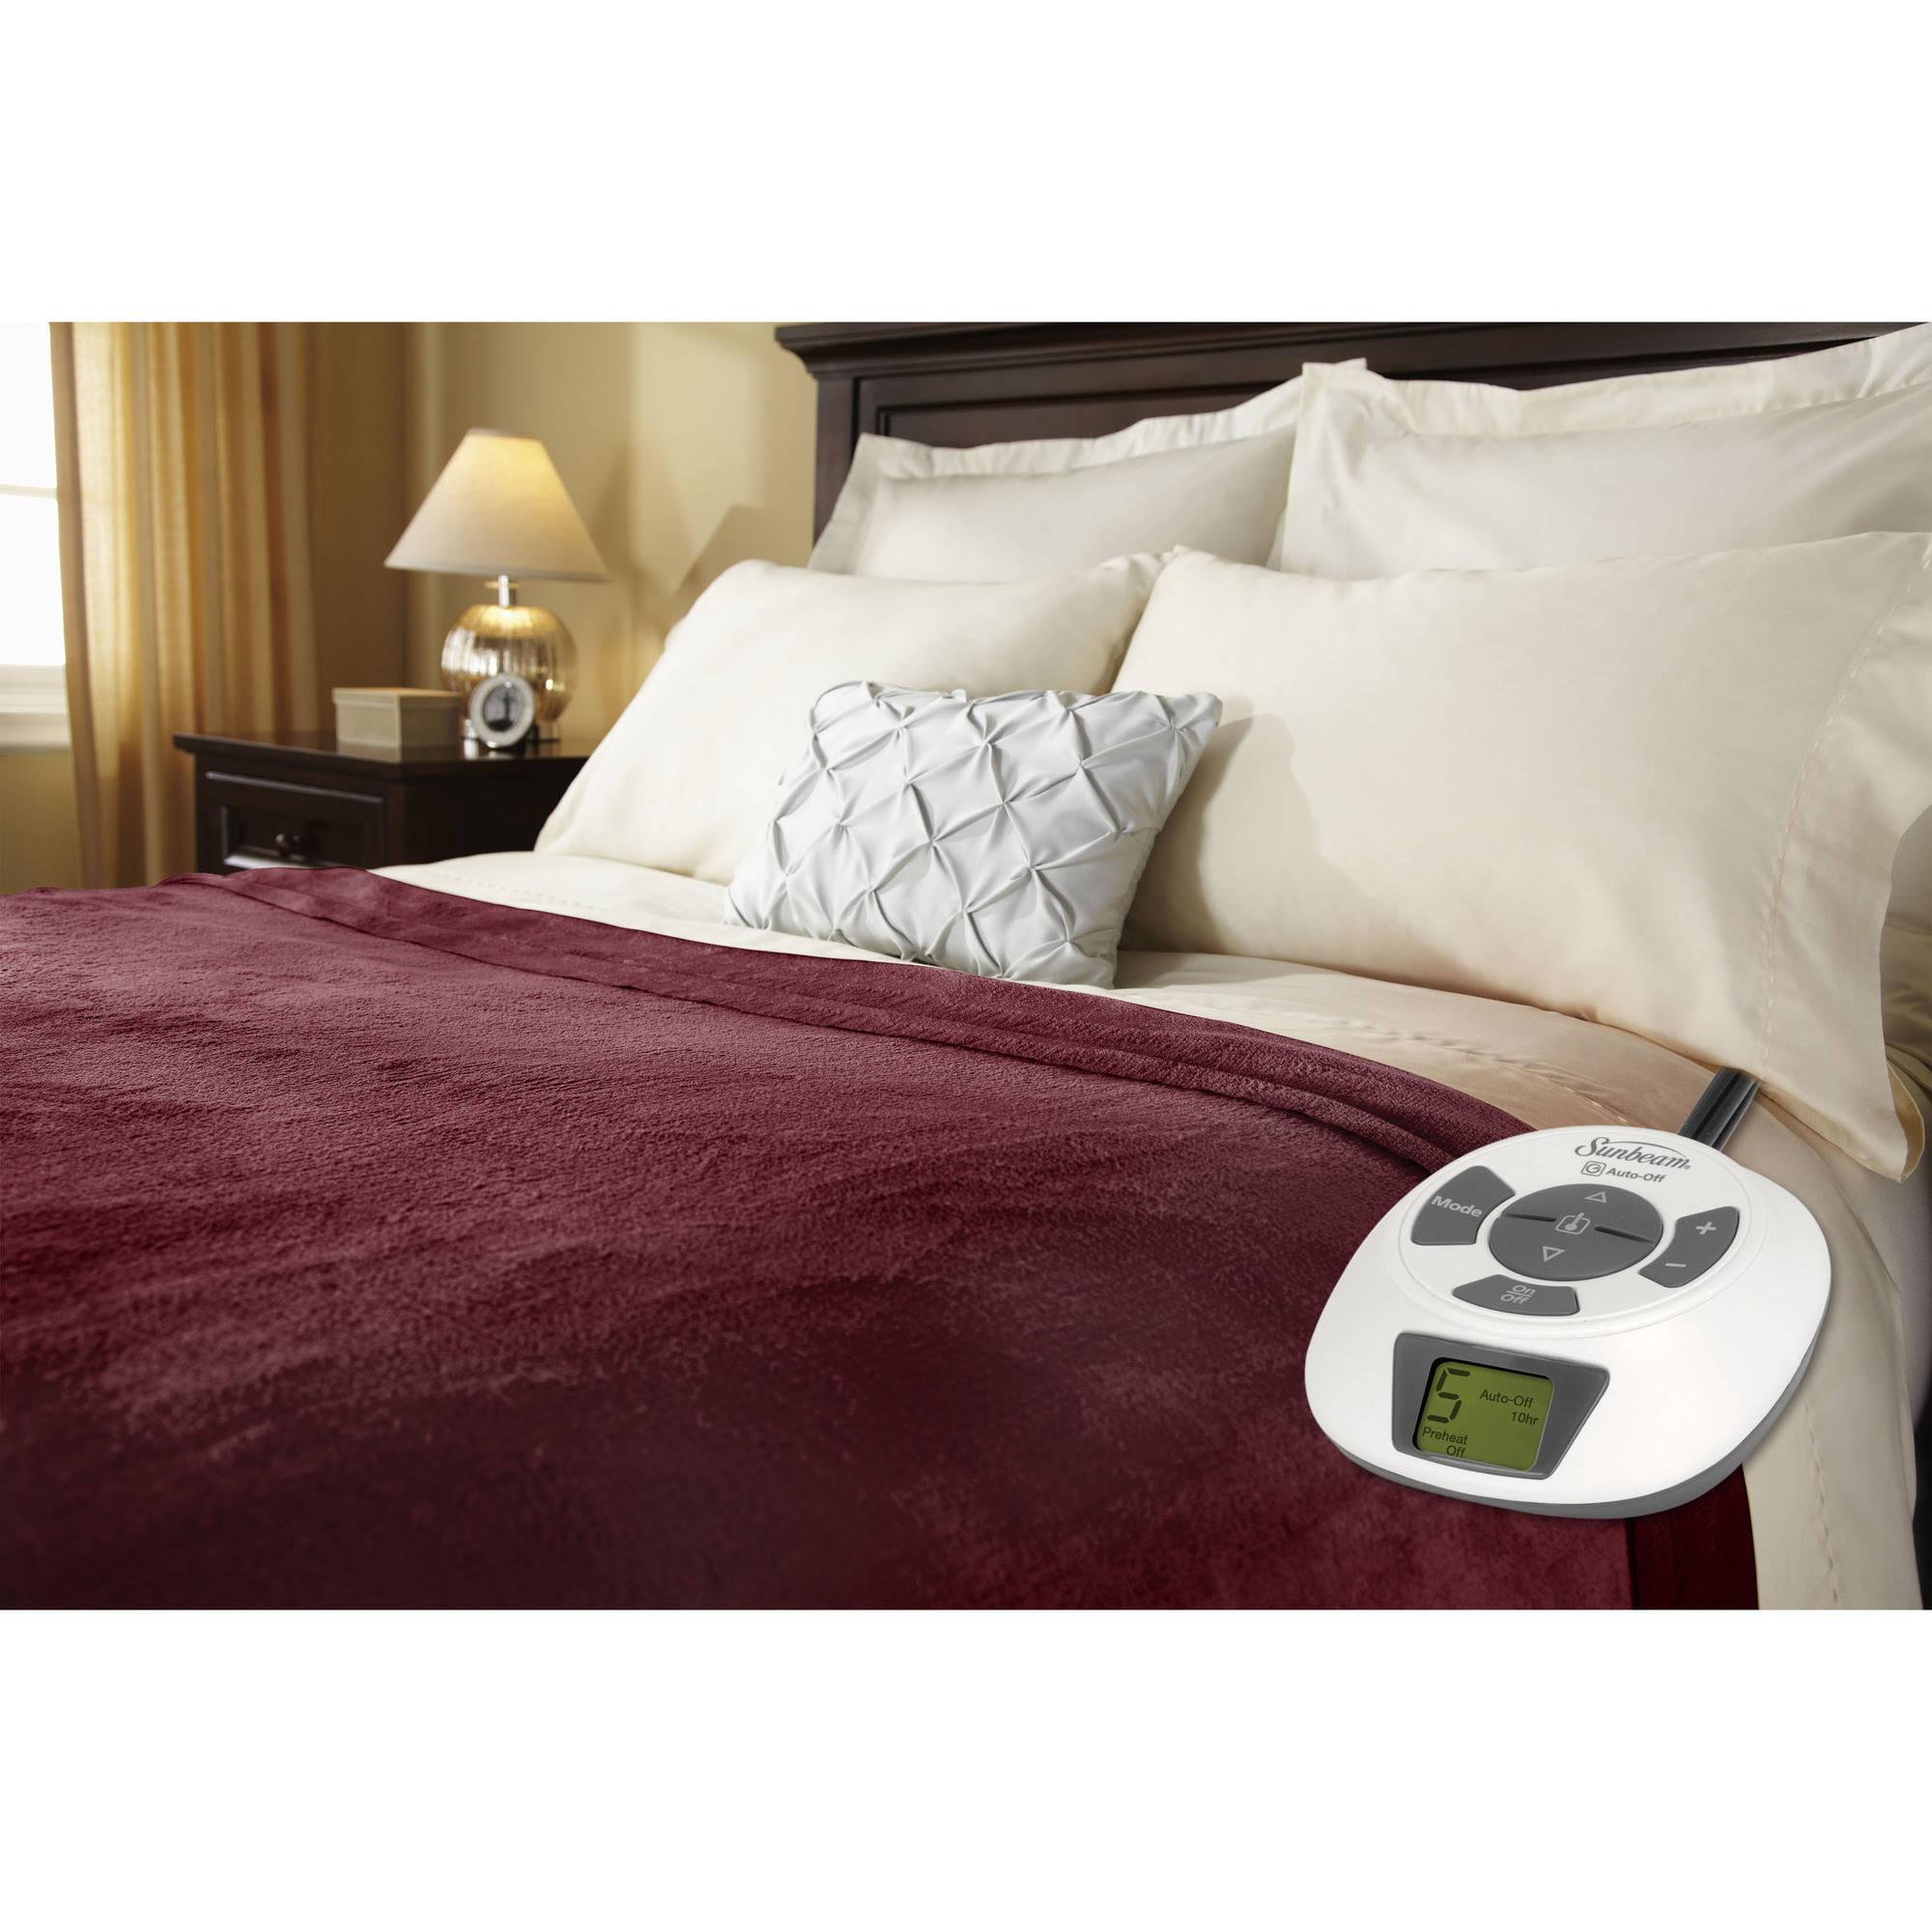 Sunbeam Electric Heated Velvet Plush Blanket   Walmart.com